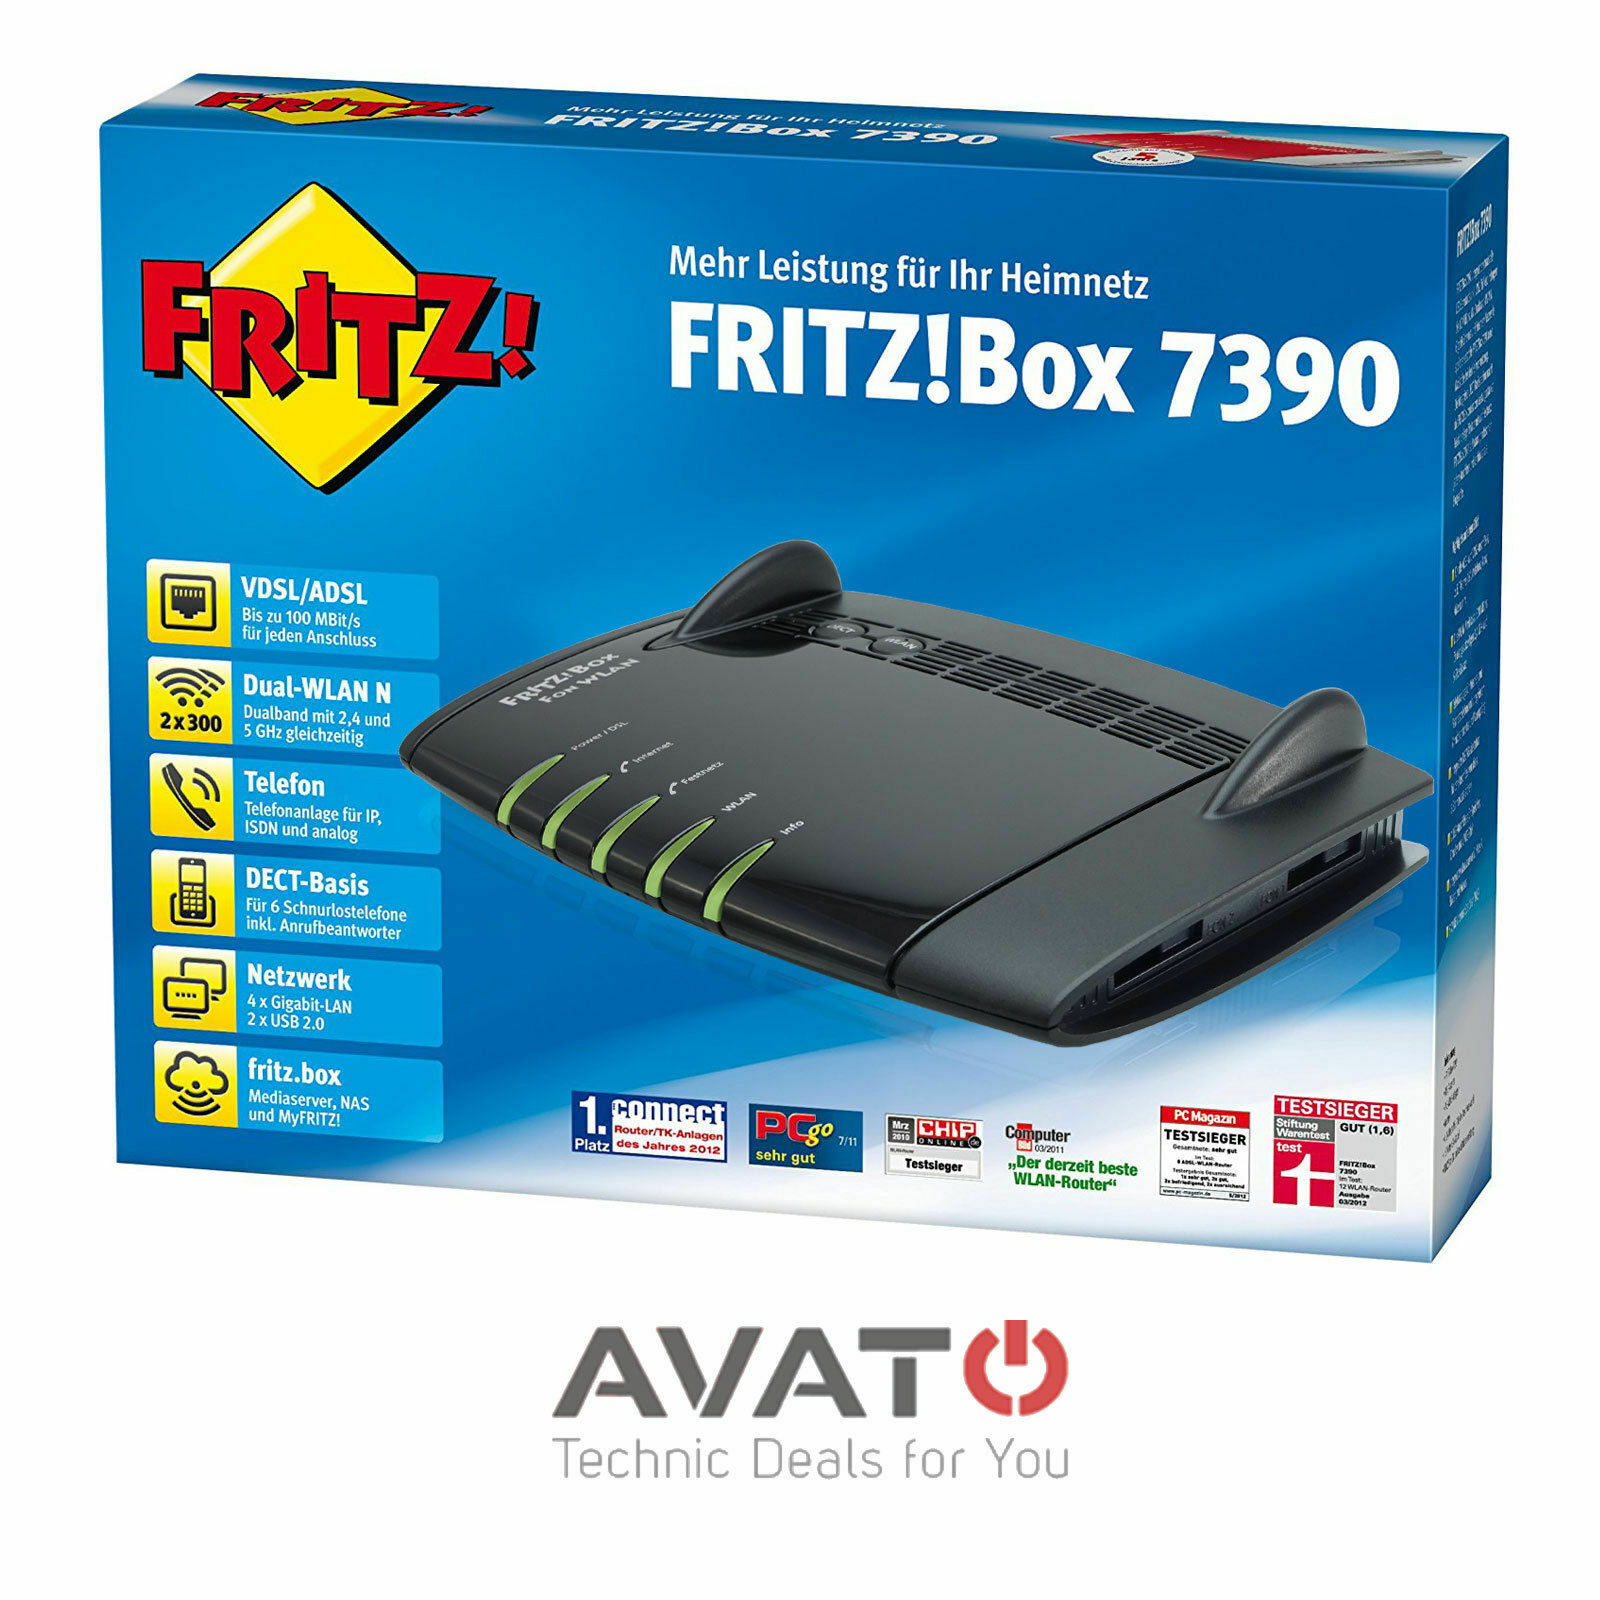 AVM FRITZBox 7390 INTERNATIONAL VDSL DSL Modem Gigabit #2 Jahre Gewährleistung#